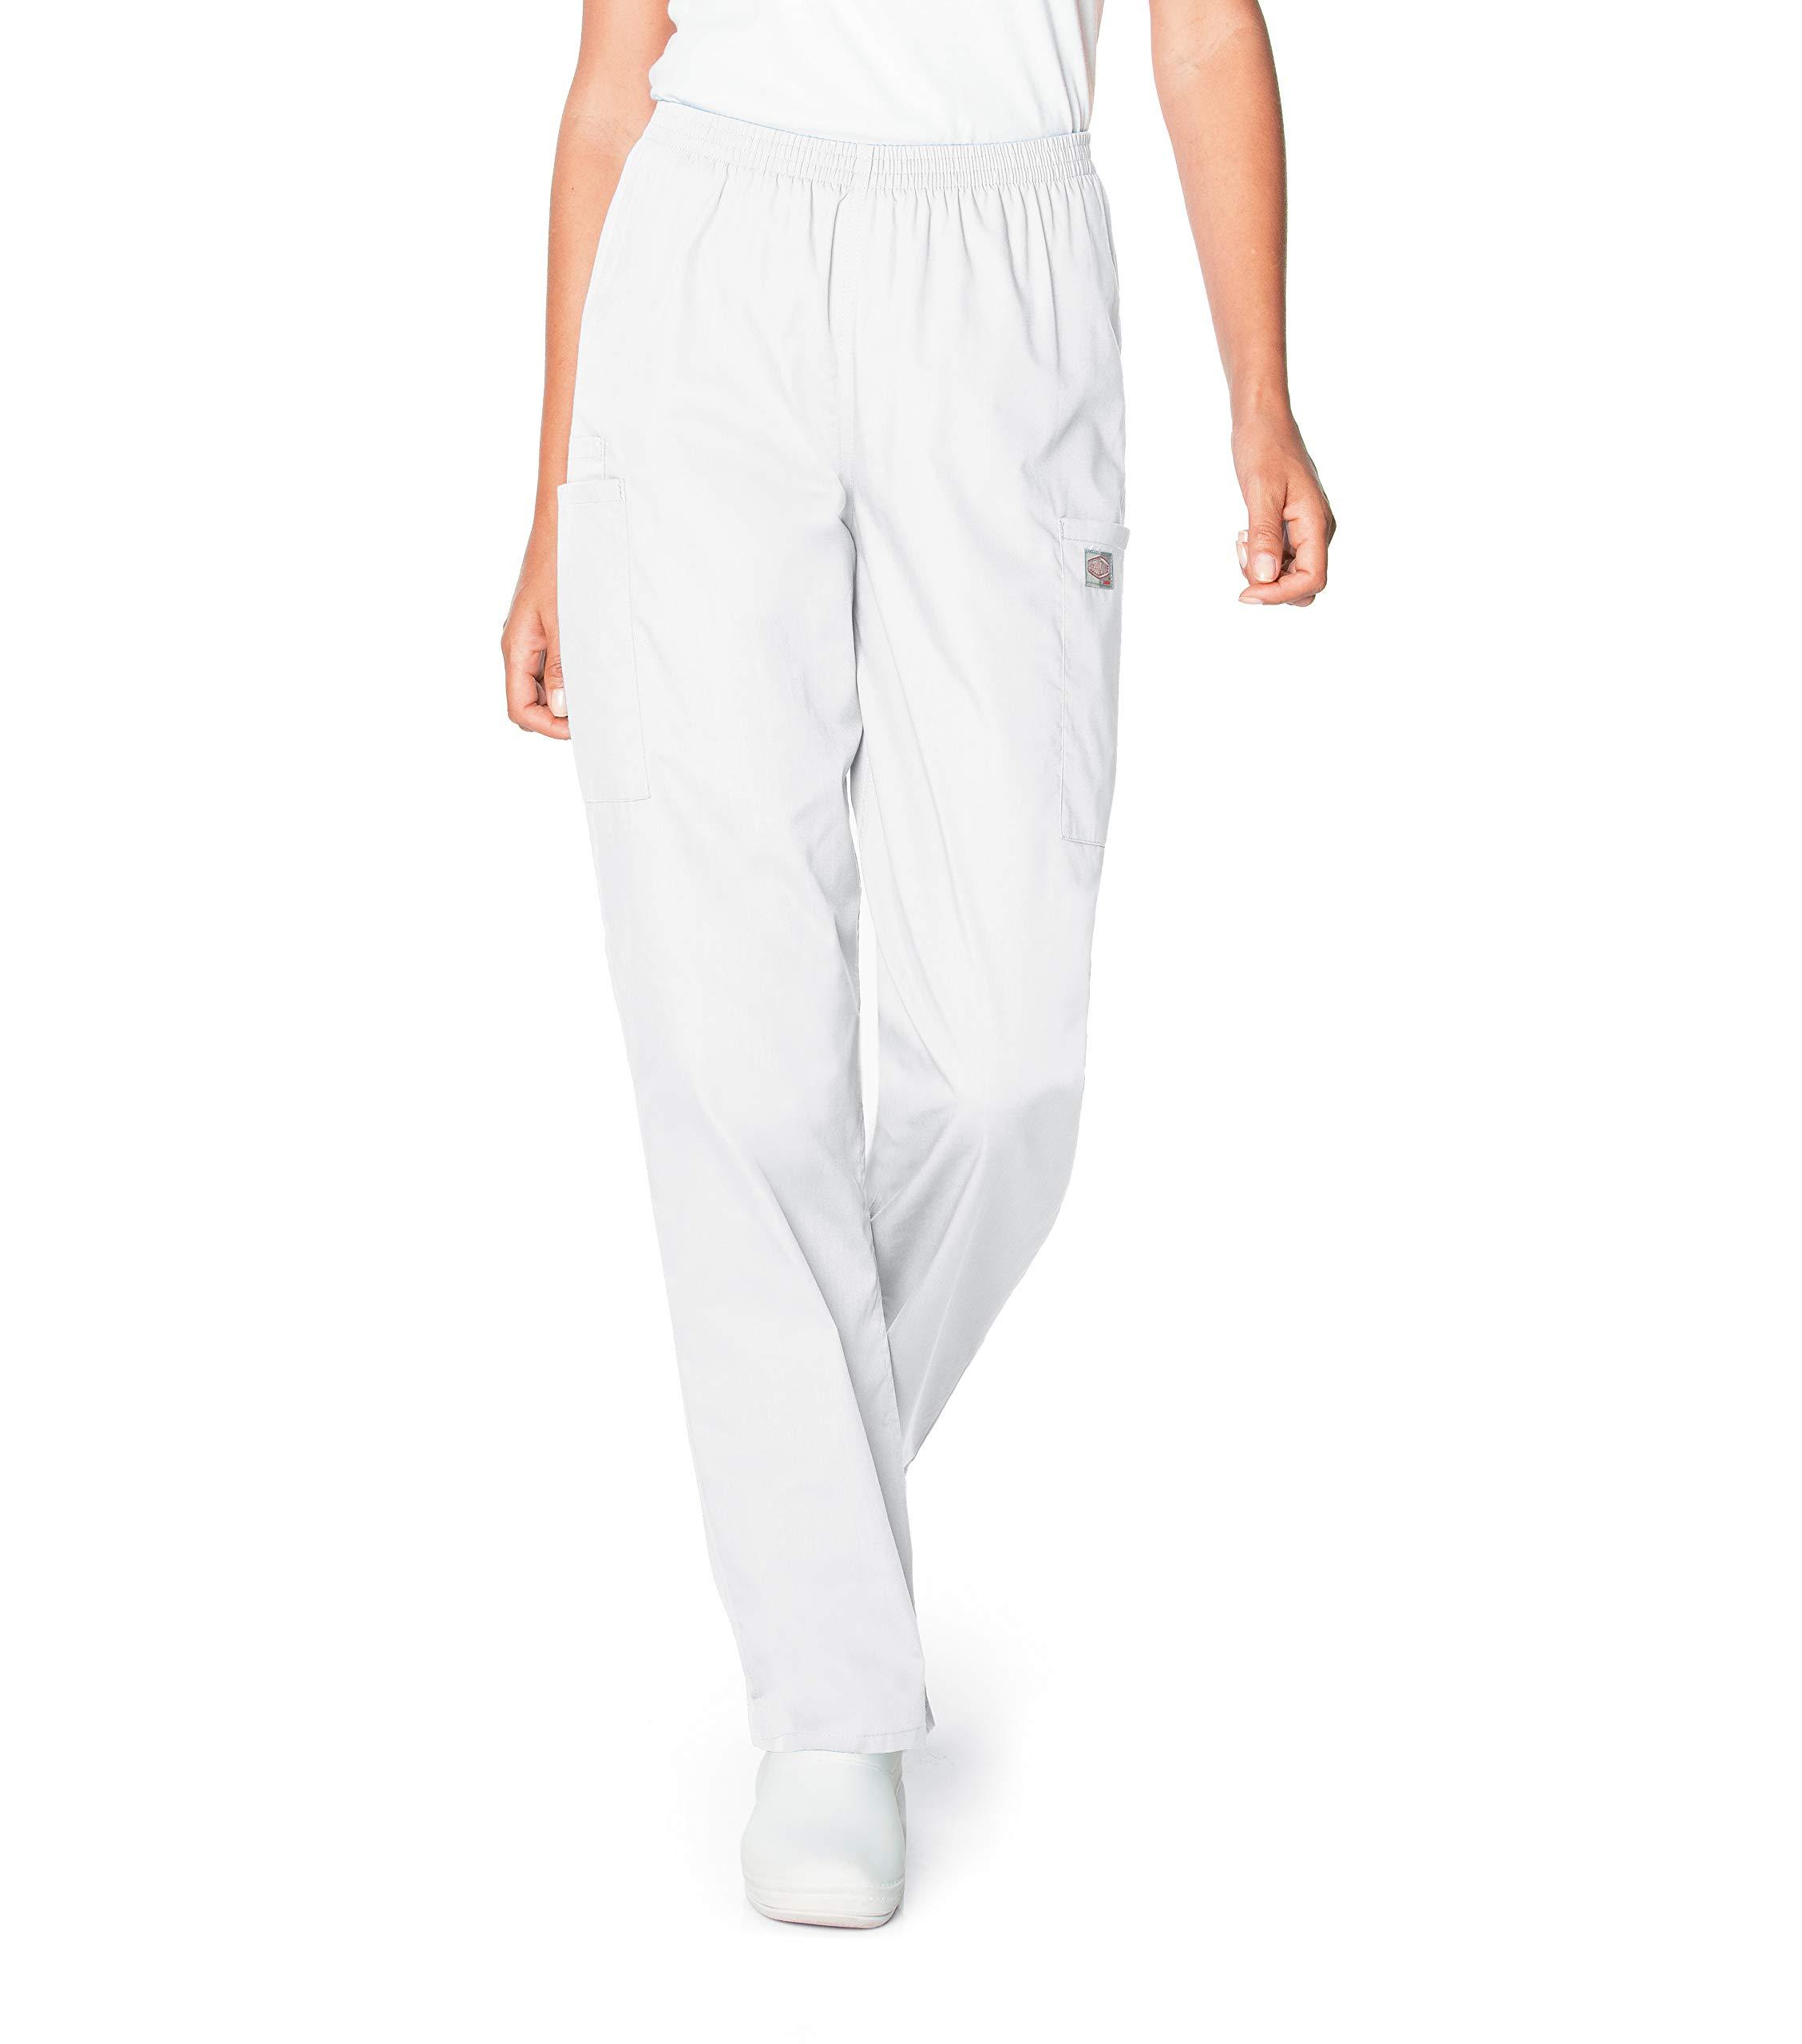 Scrub Zone Women's Durable 2-Pocket Elastic Waist Classic Fit Cargo Scrub Pant, White, Large